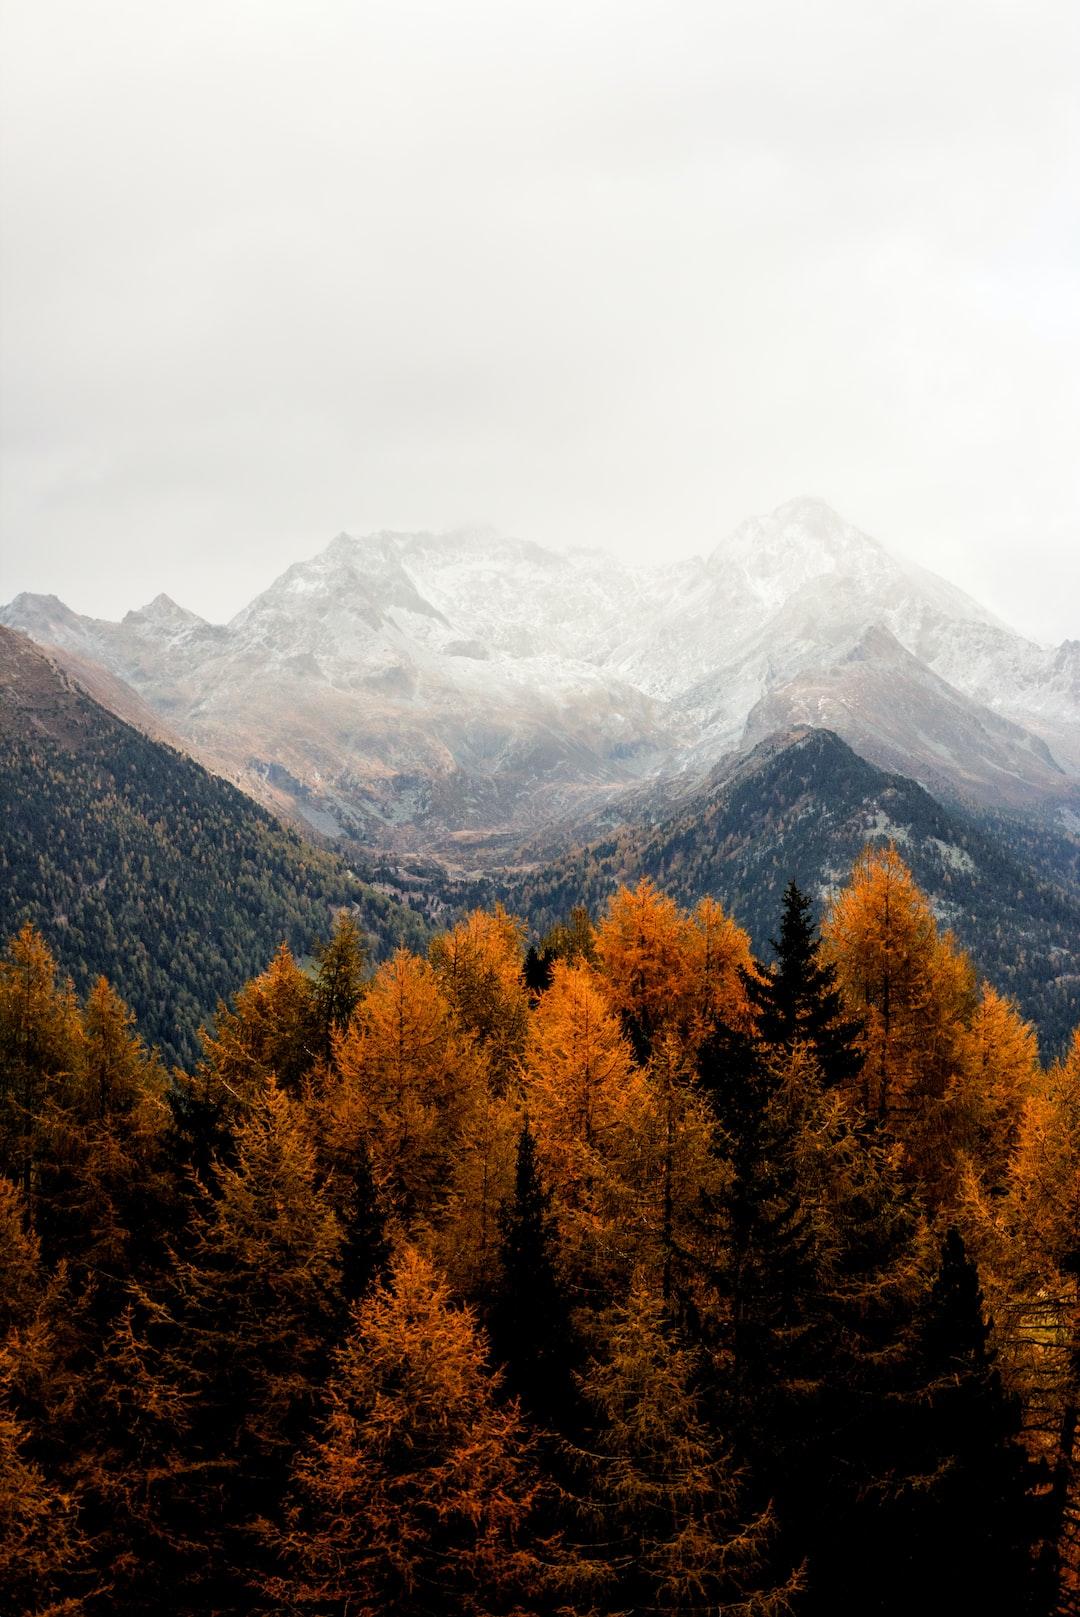 foto de Autumn Wallpapers: Free HD Download [500+ HQ]   Unsplash